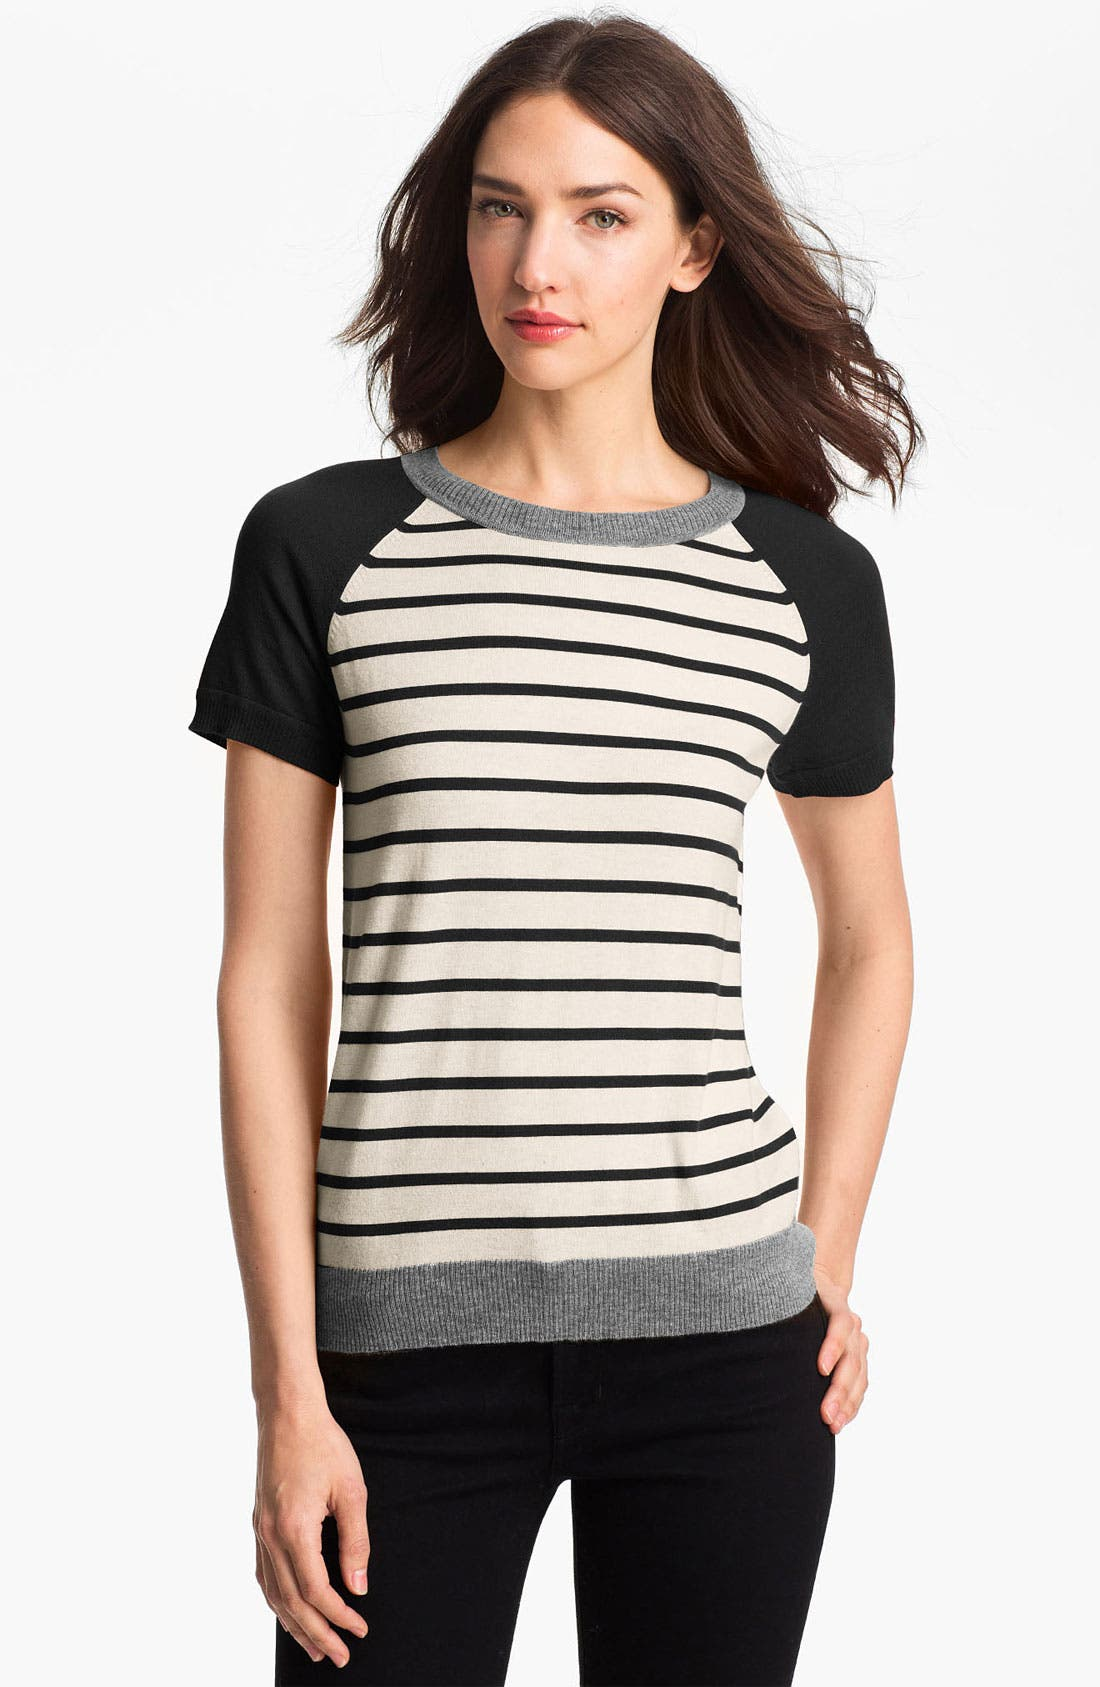 Alternate Image 1 Selected - Joie 'Kadee' Sweater